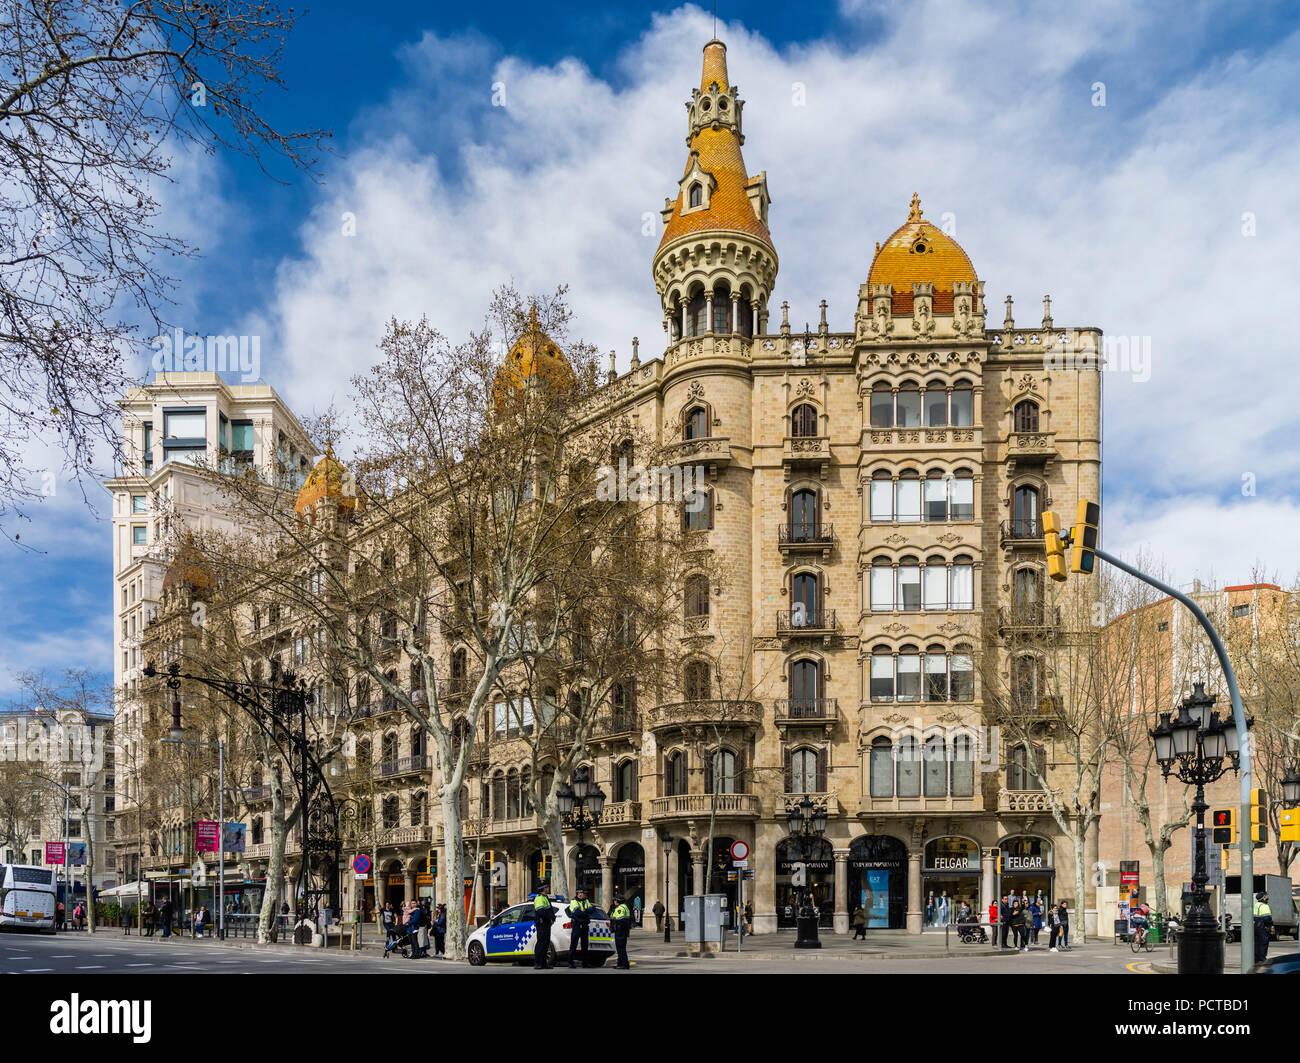 Barcelona city centre - Stock Image